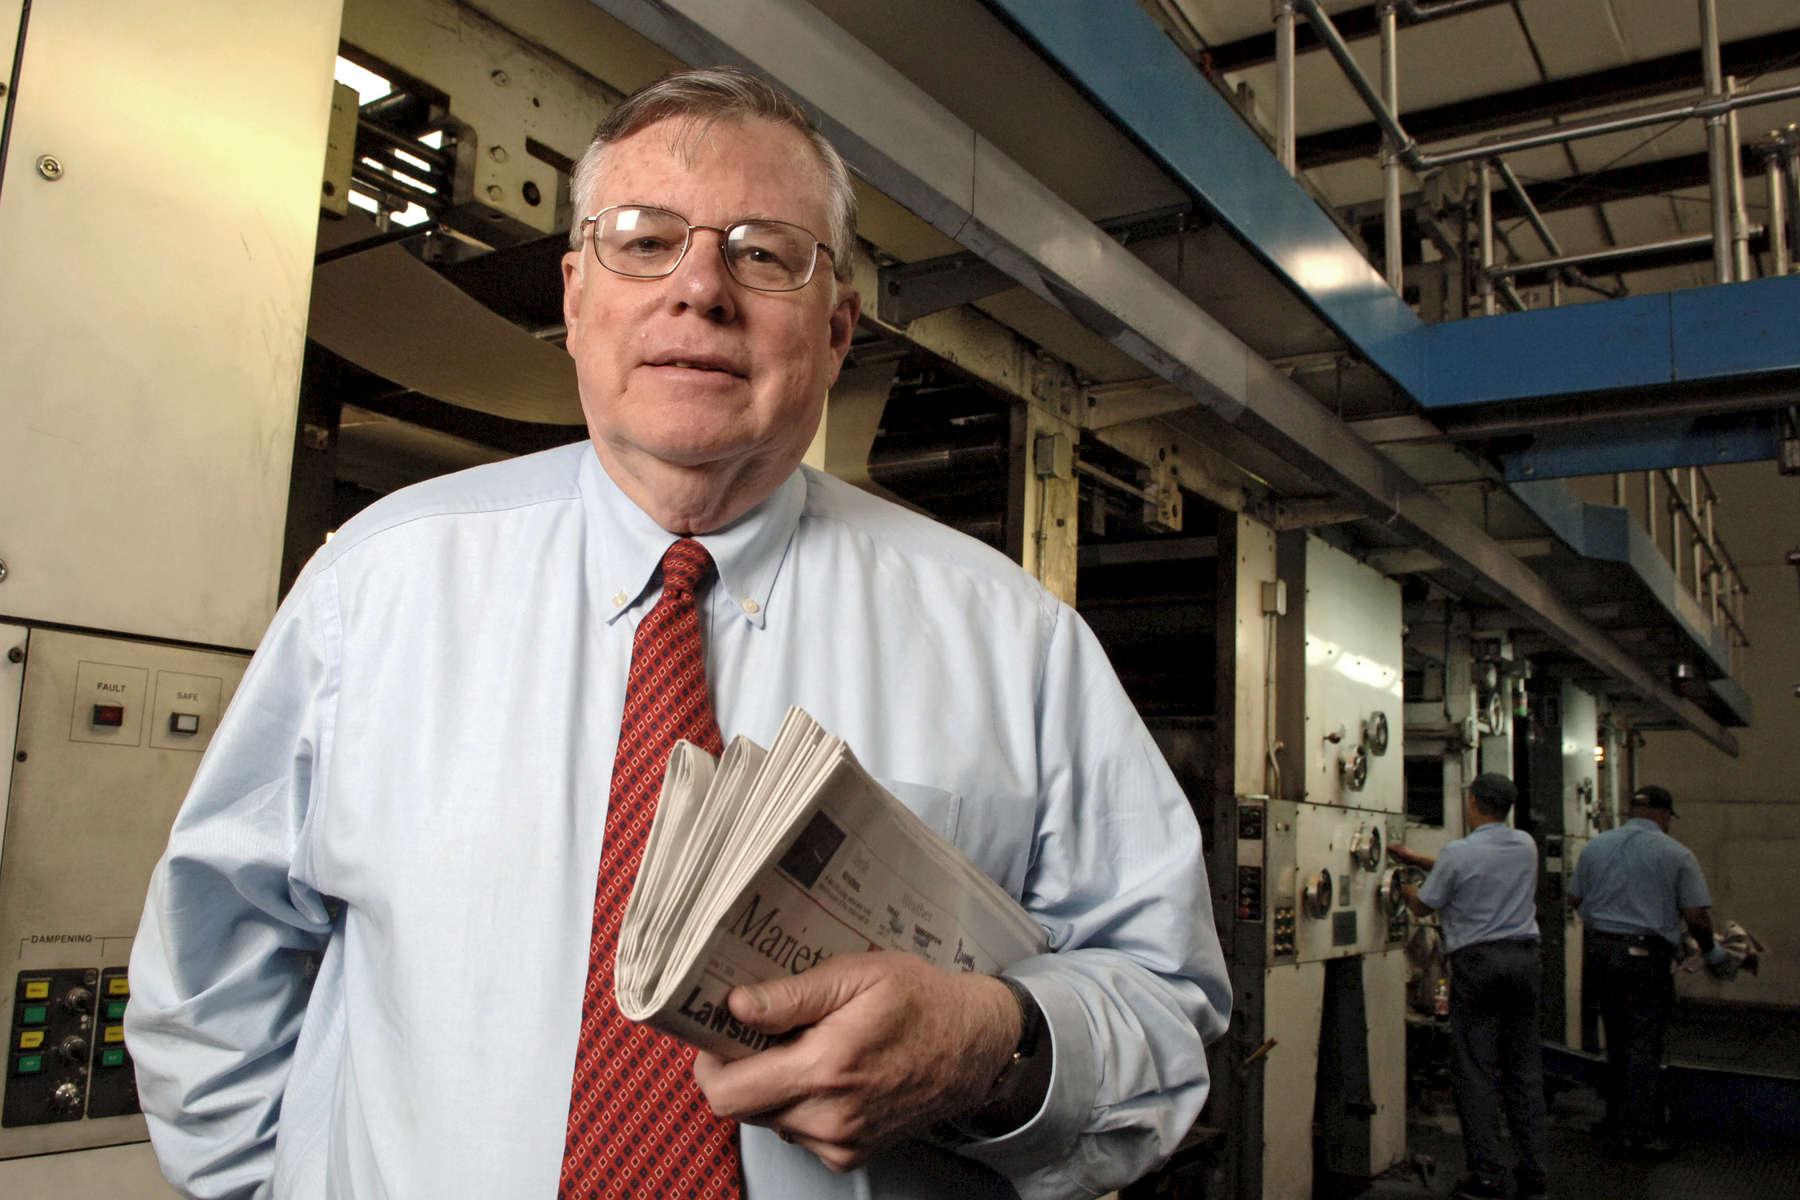 Otis Brumby, publisher, Marietta Daily Journal, Marietta, GA, and UGA Foundation trustee. 5/31/05